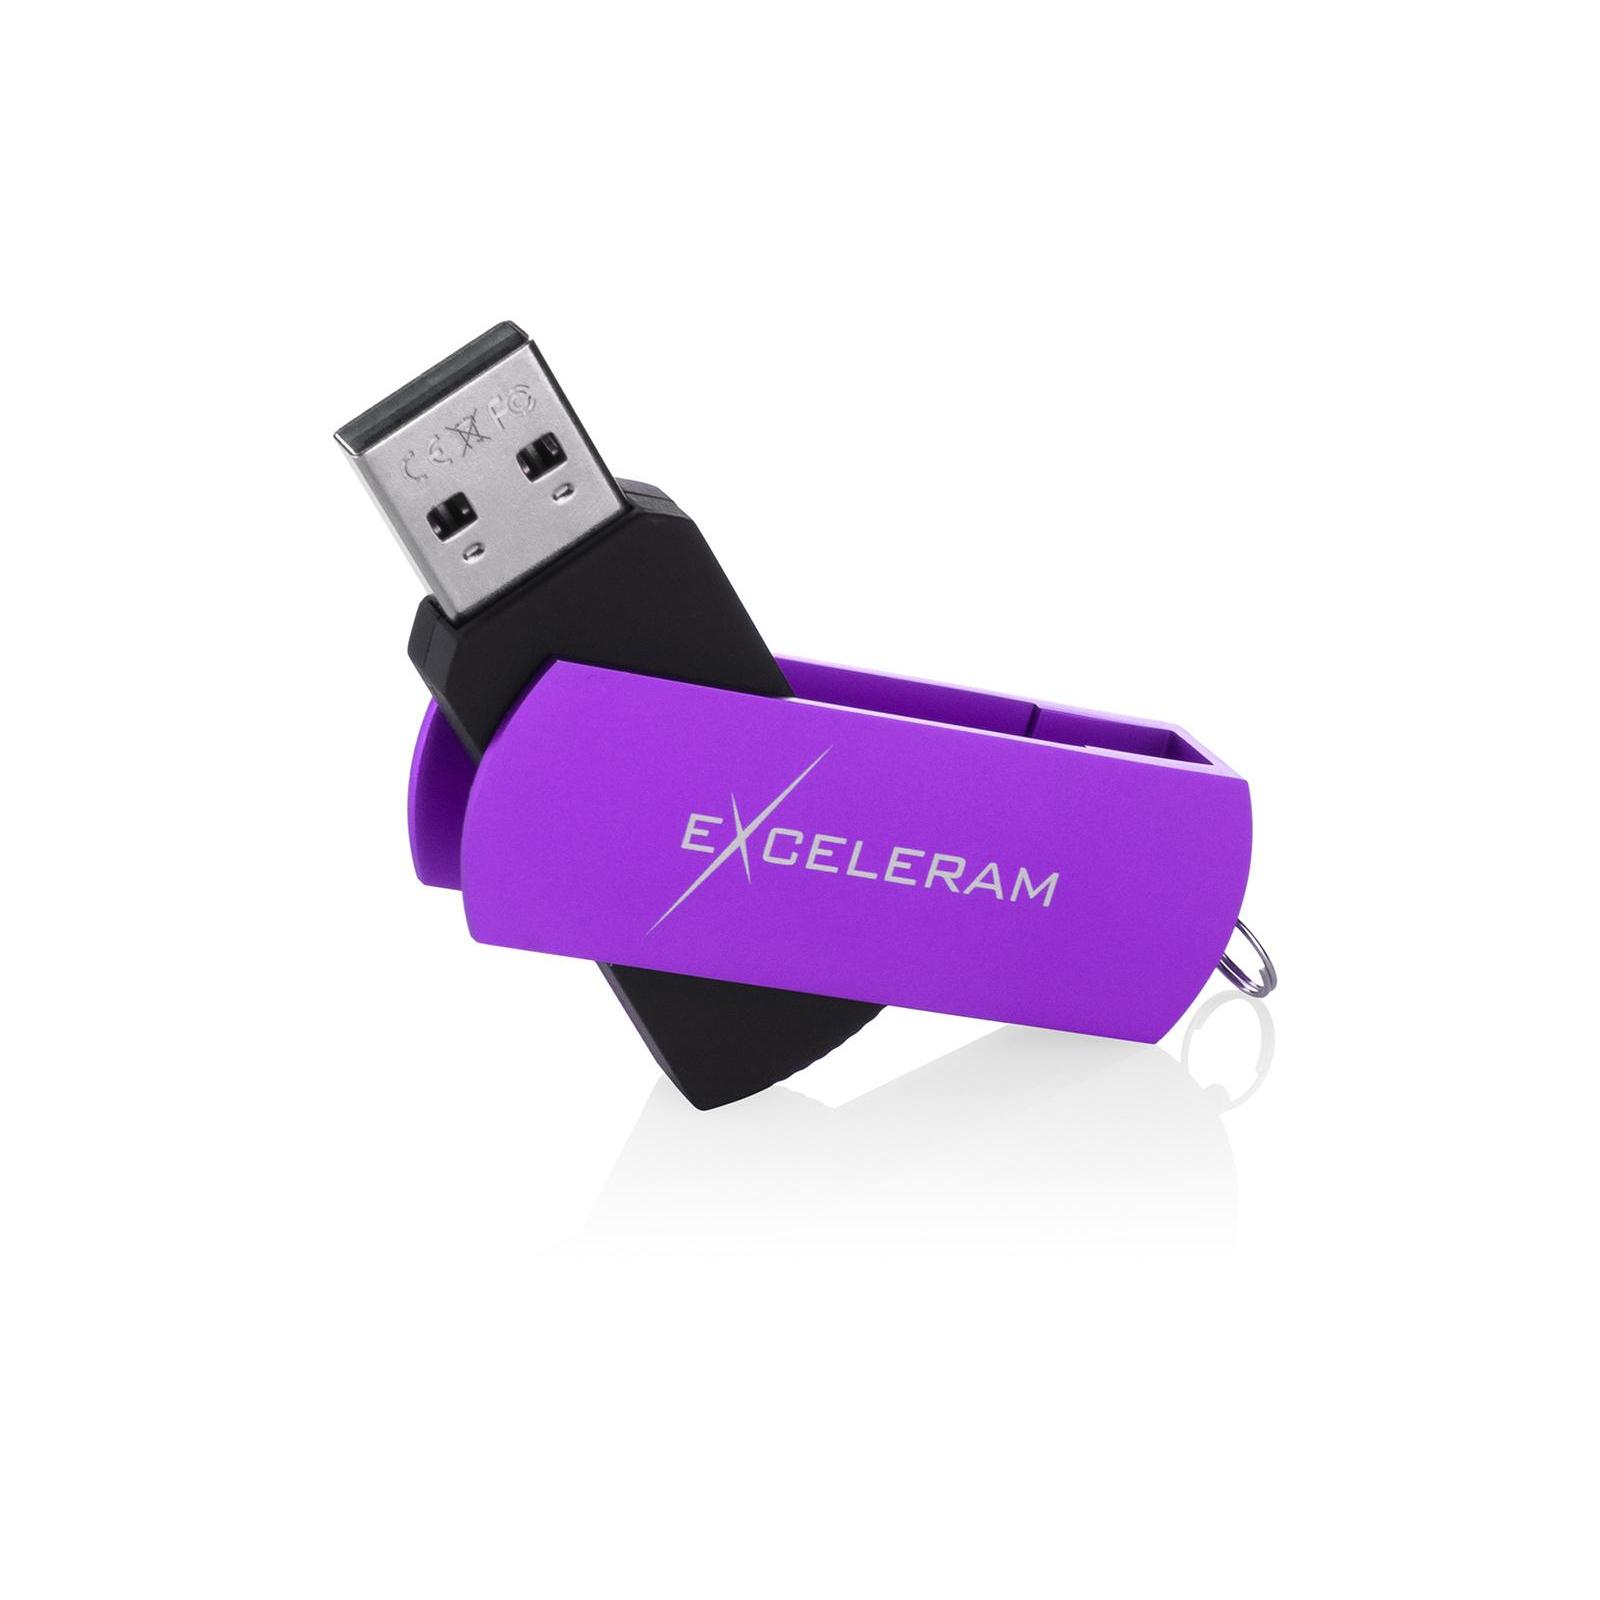 USB флеш накопитель eXceleram 16GB P2 Series Brown/Black USB 3.1 Gen 1 (EXP2U3BRB16) изображение 3